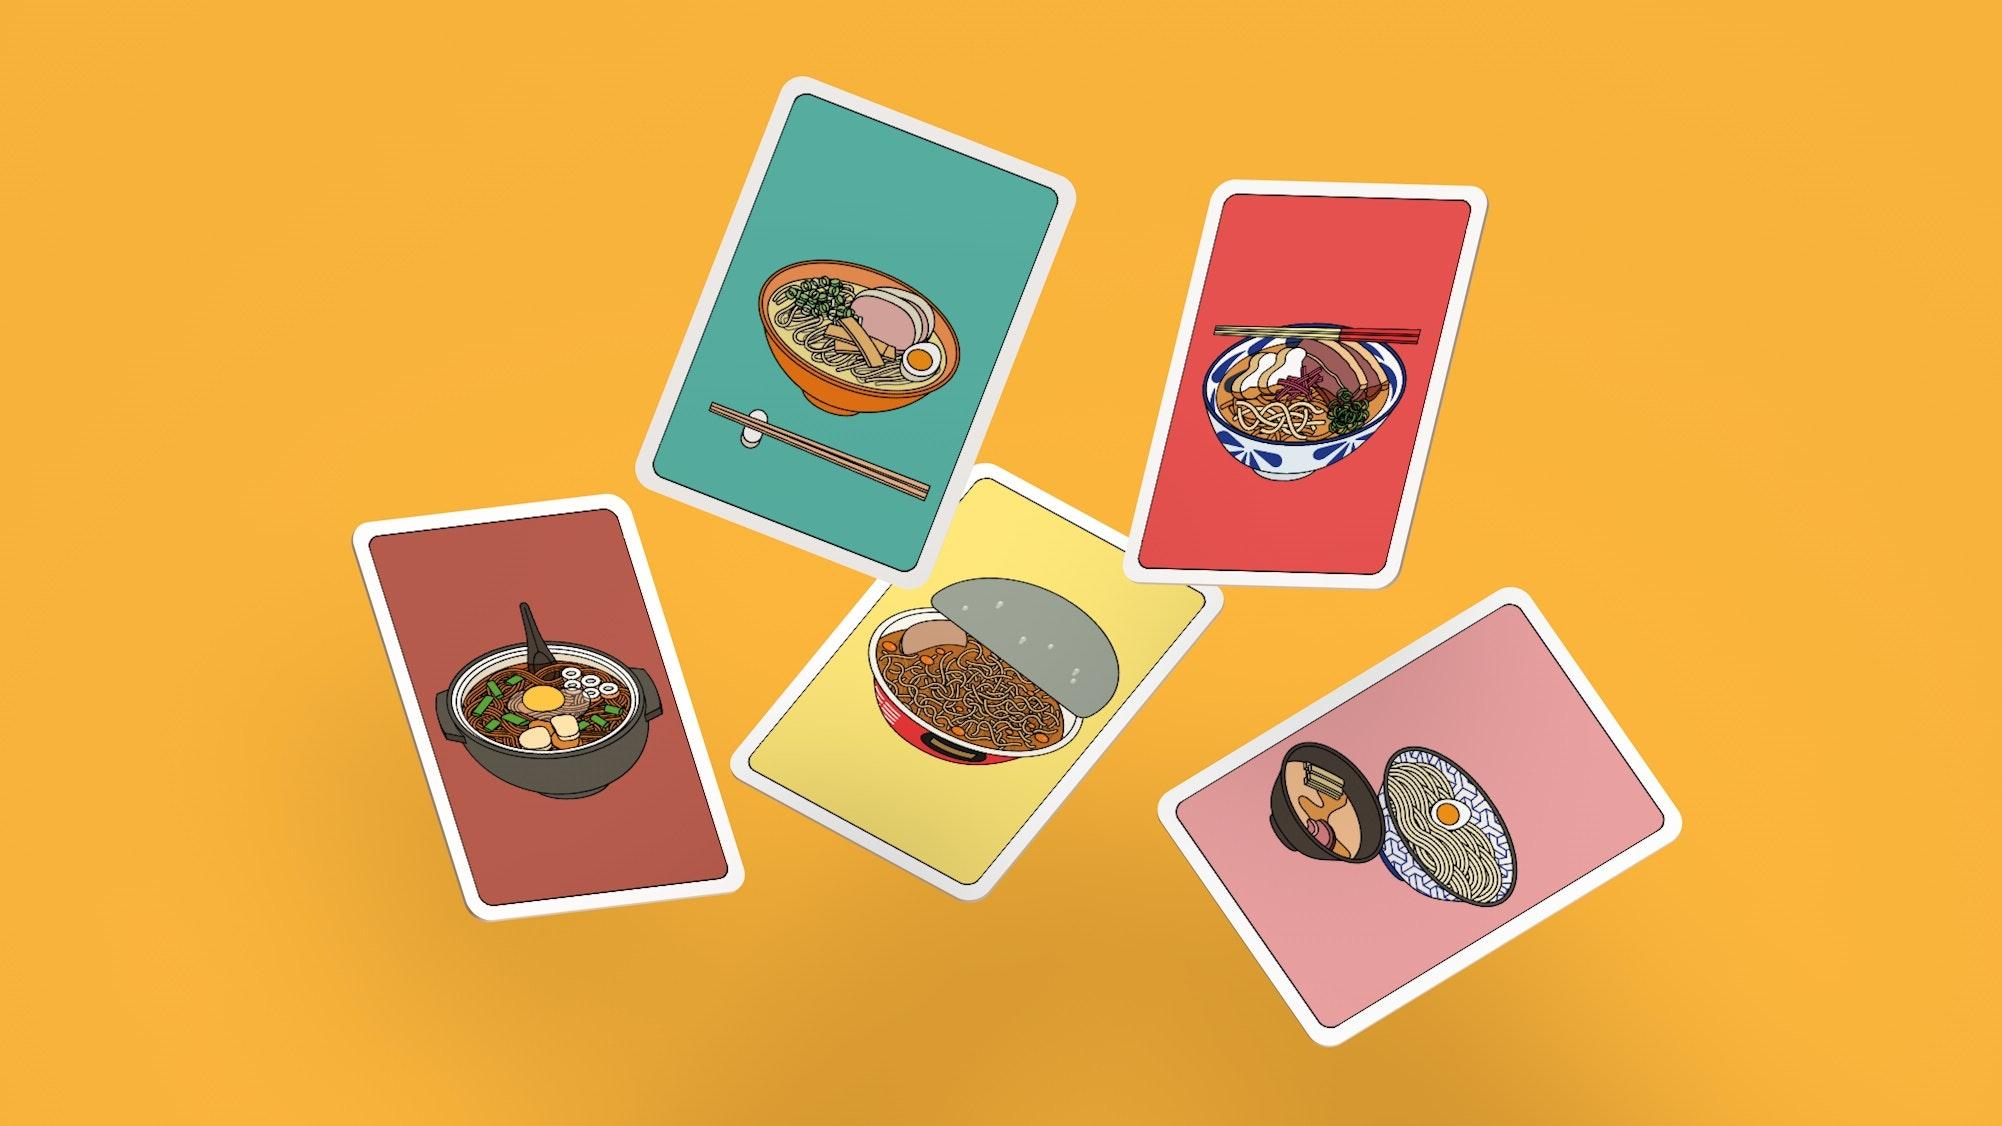 Emile - cards random